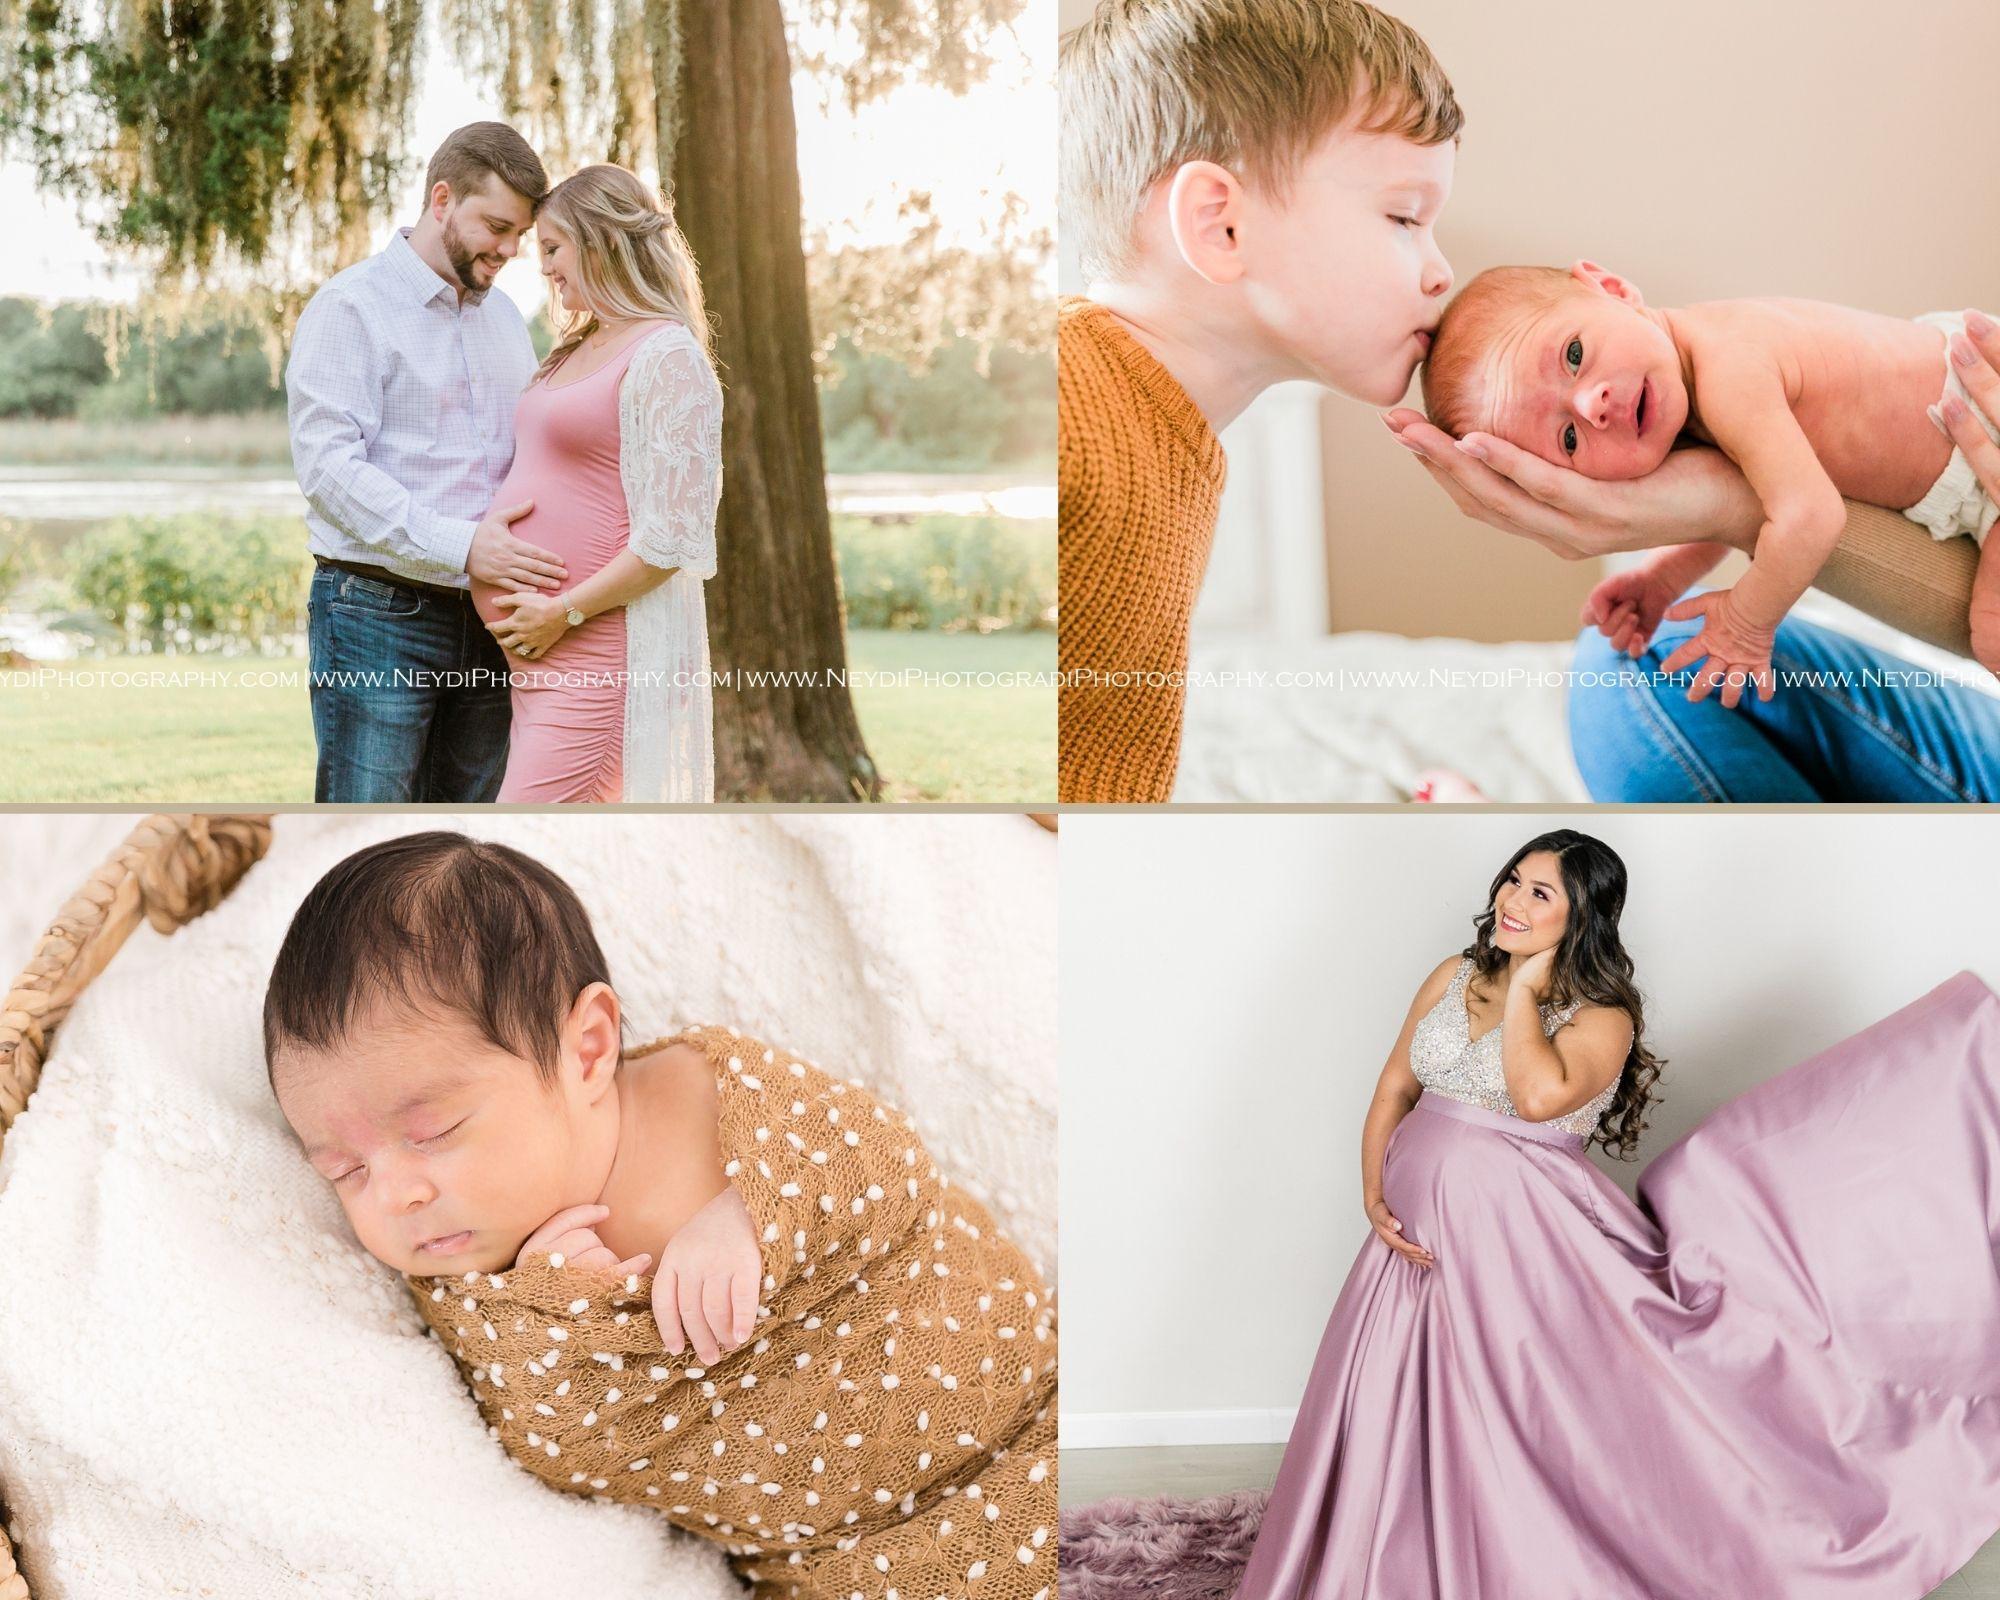 Maternity & Newborn Lifestyle Session